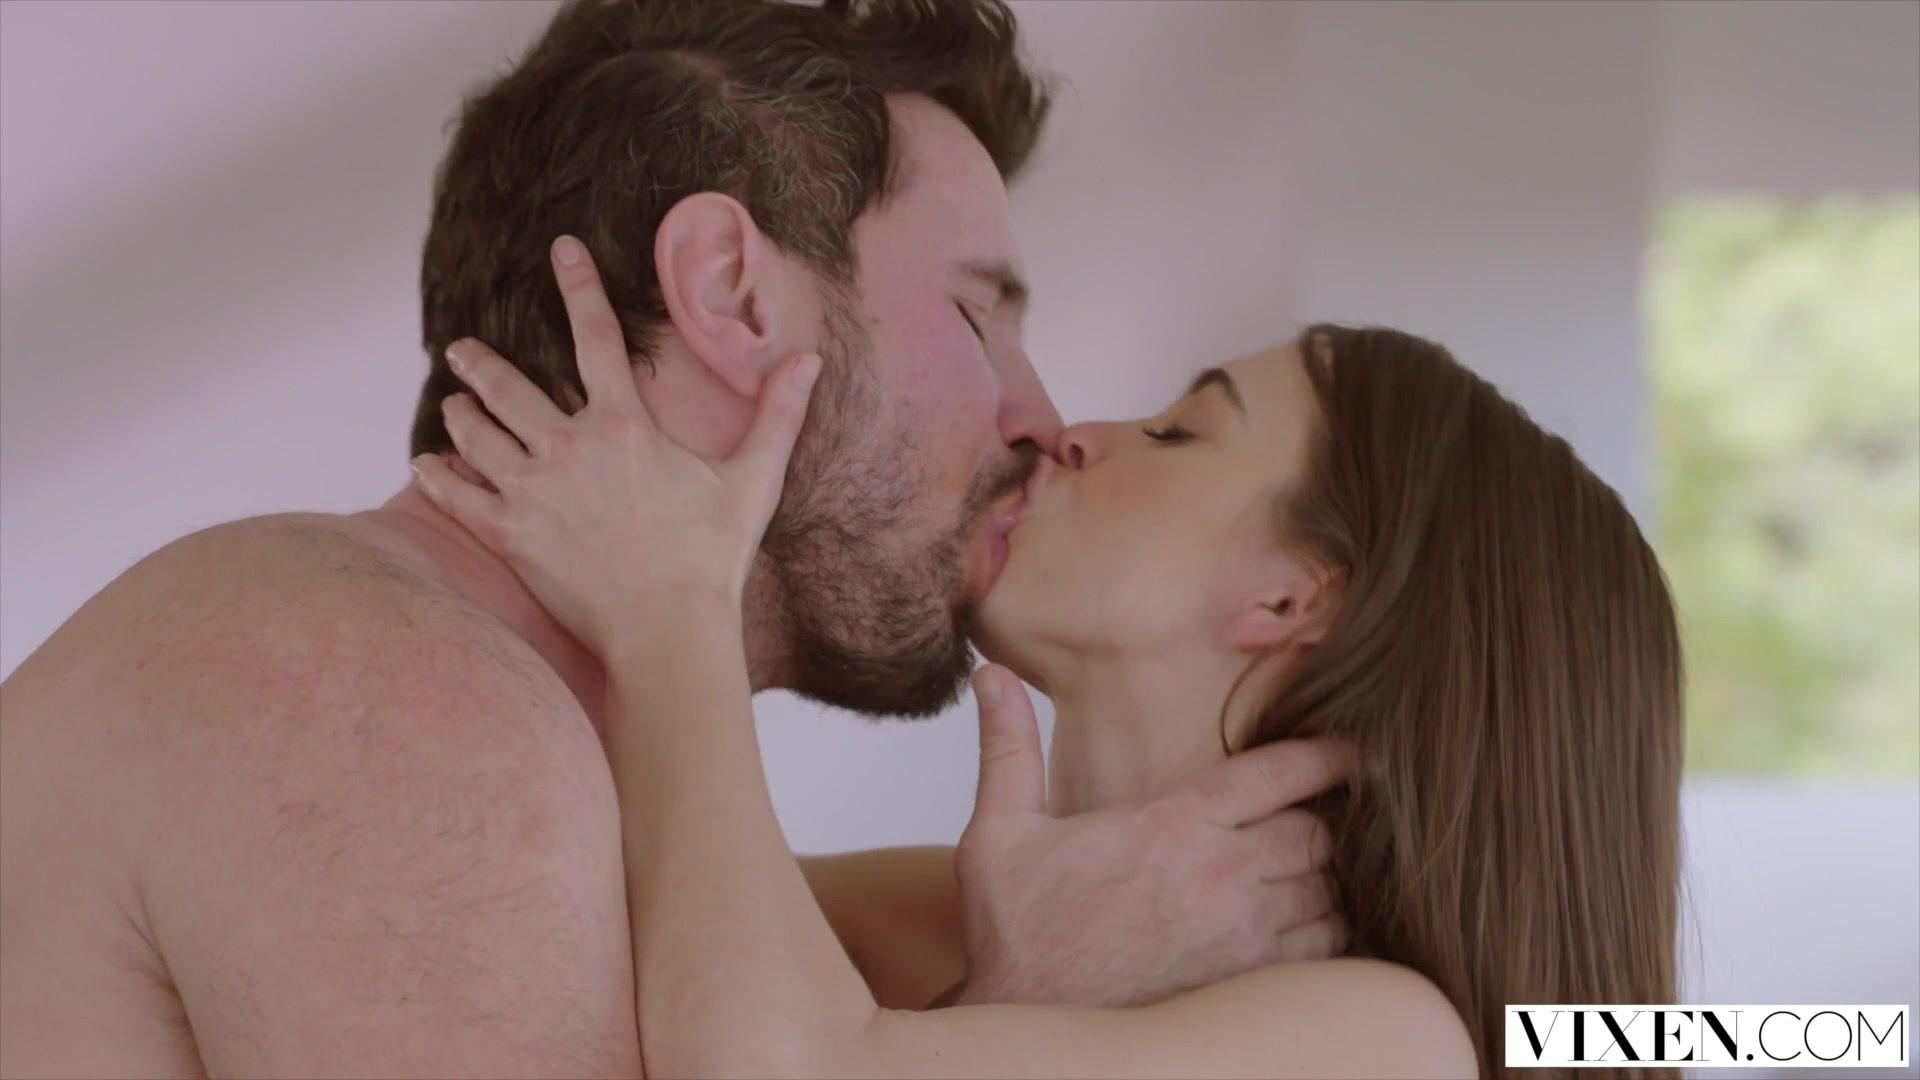 Optimus prime g1 latino dating Hot xXx Video